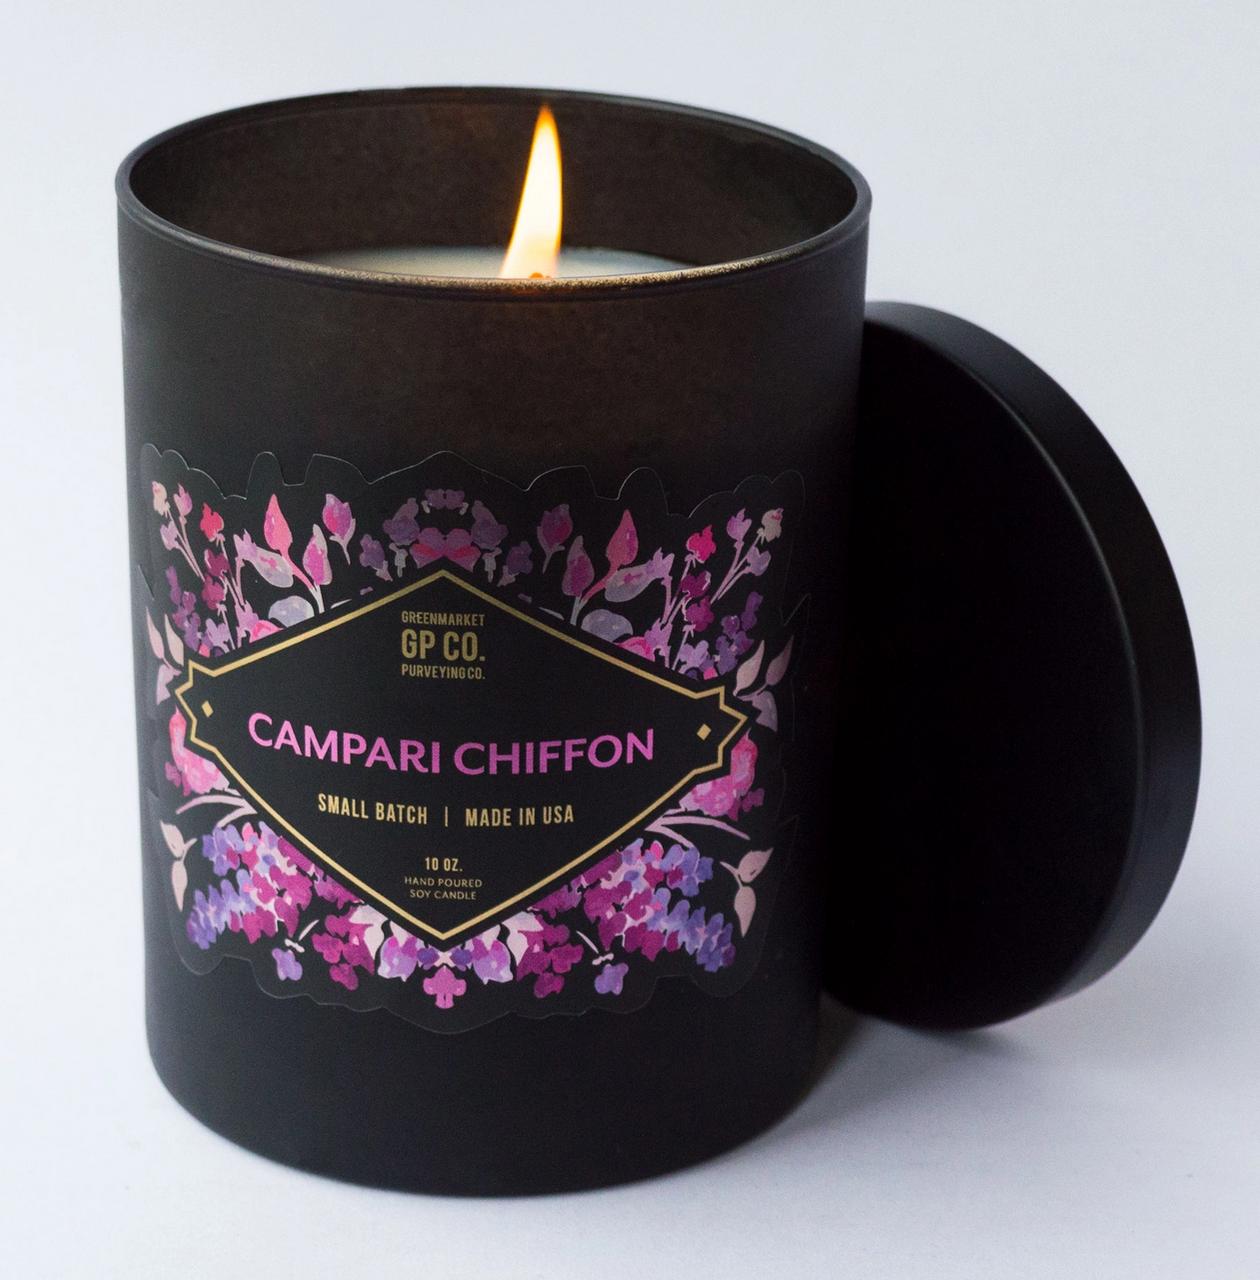 Greenmarket Purveying Co. The Awakening Collection-Campari Chiffon